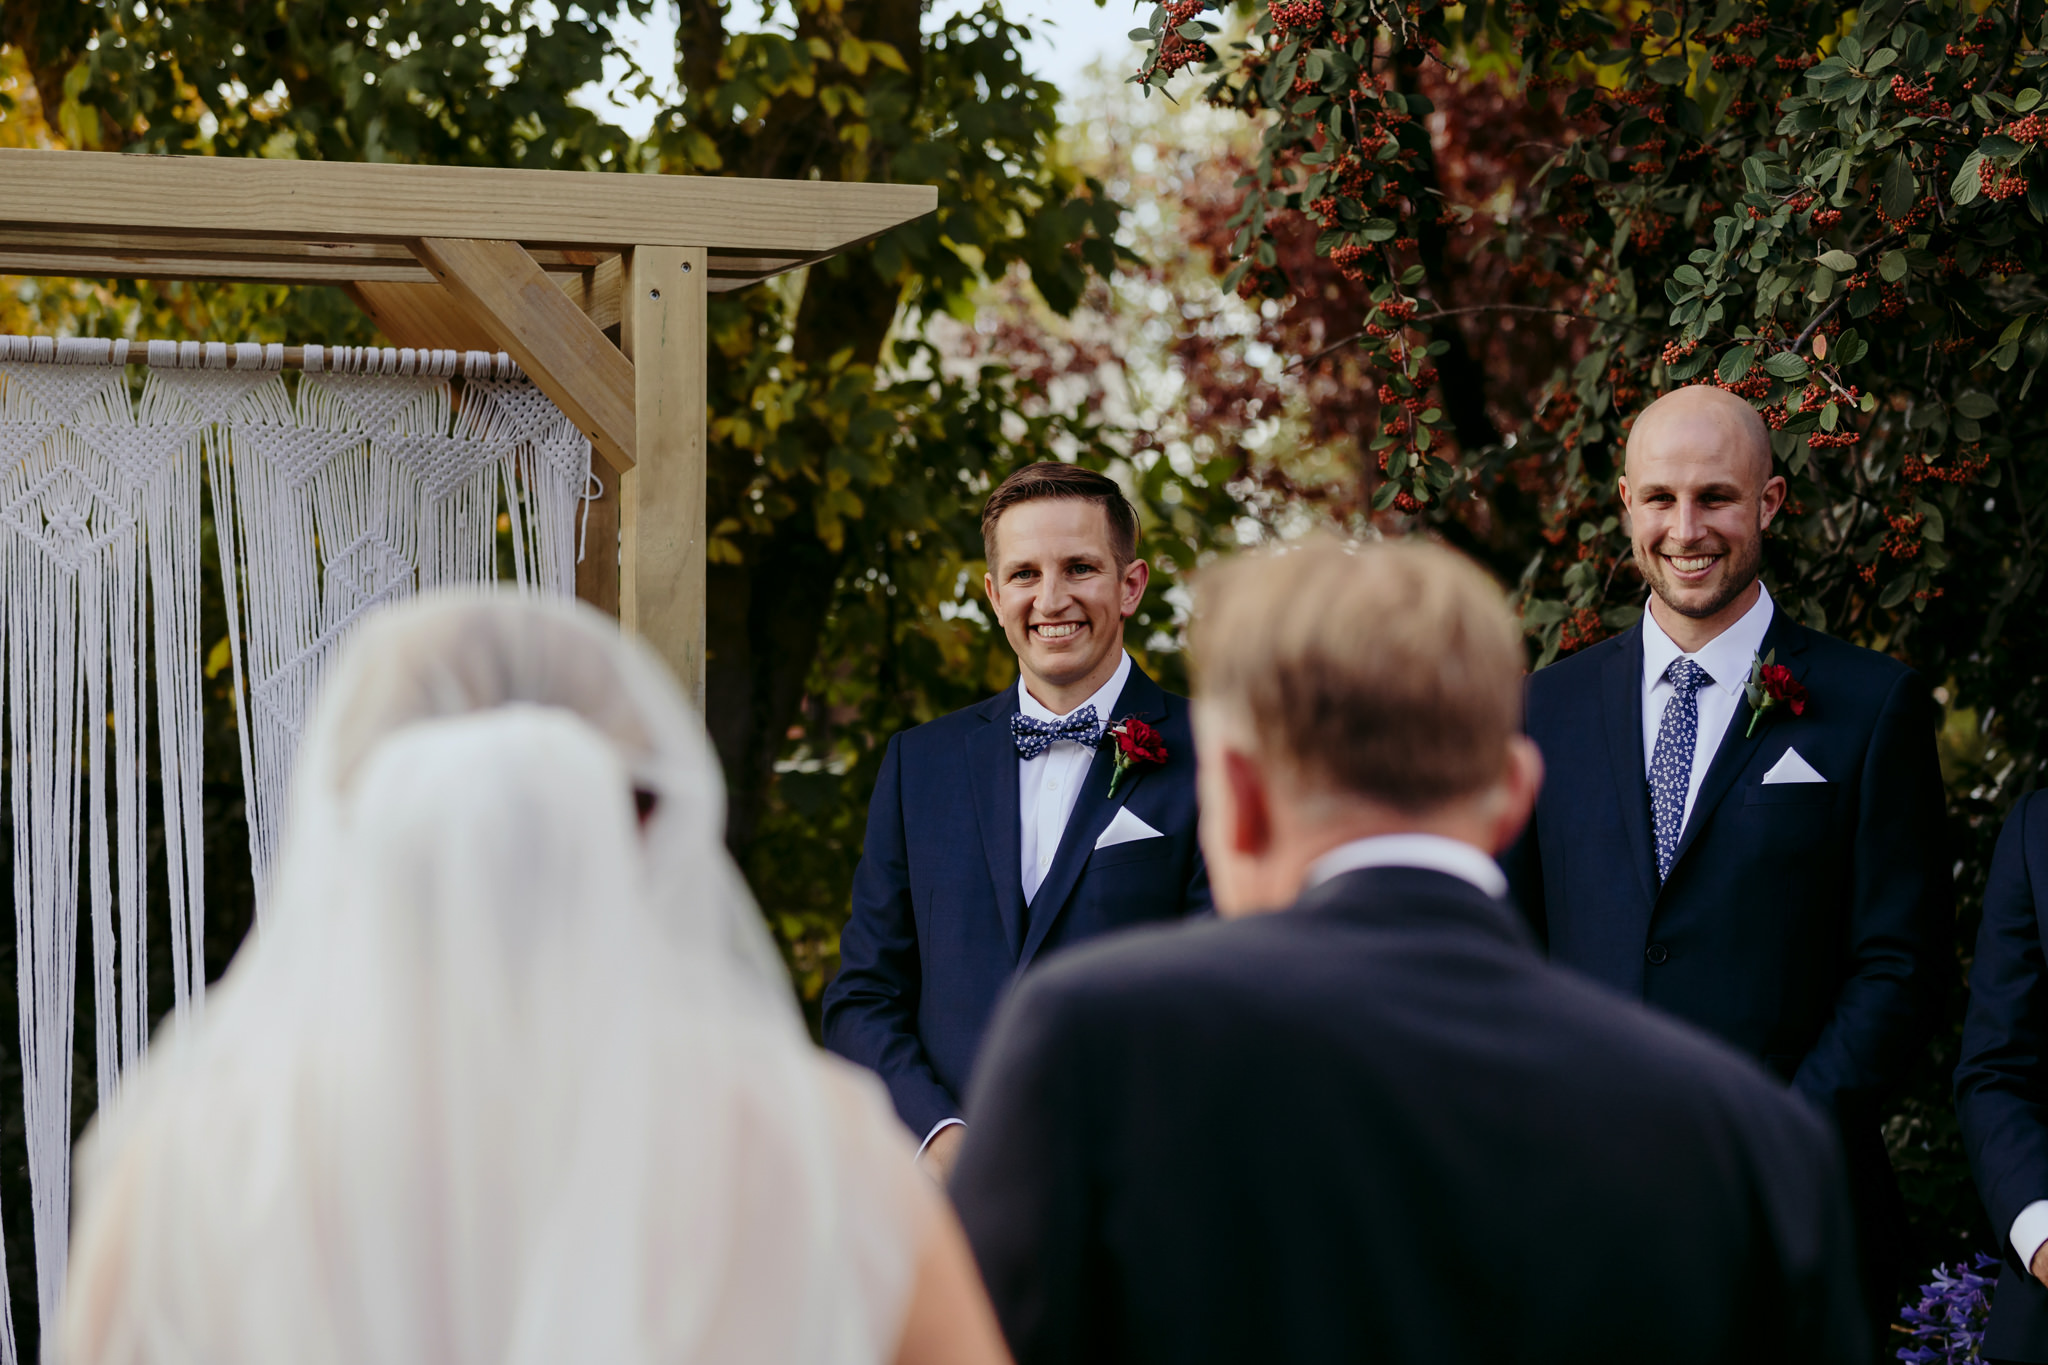 Erin Latimore Mudgee Canberra Wedding Photographer ROSEBANK GUESTHOUSE OLD THEATRE TONIC MILLTHORPE_211.JPG